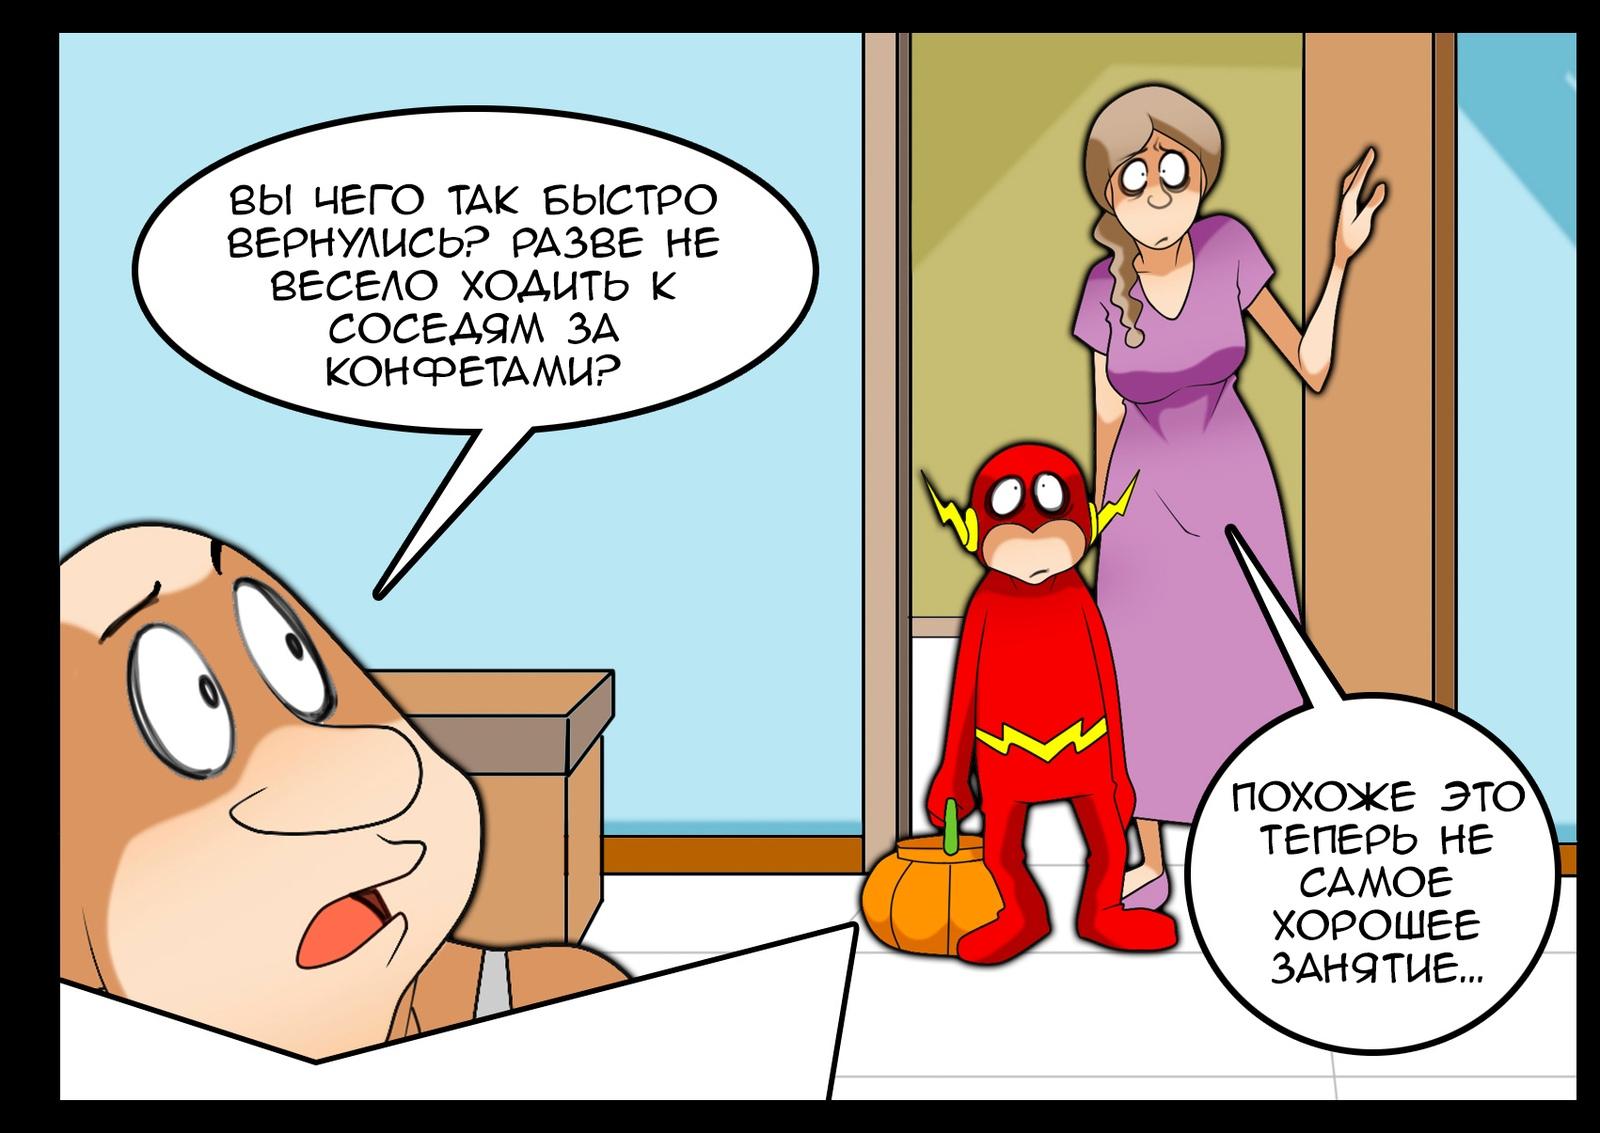 Комикс про образование